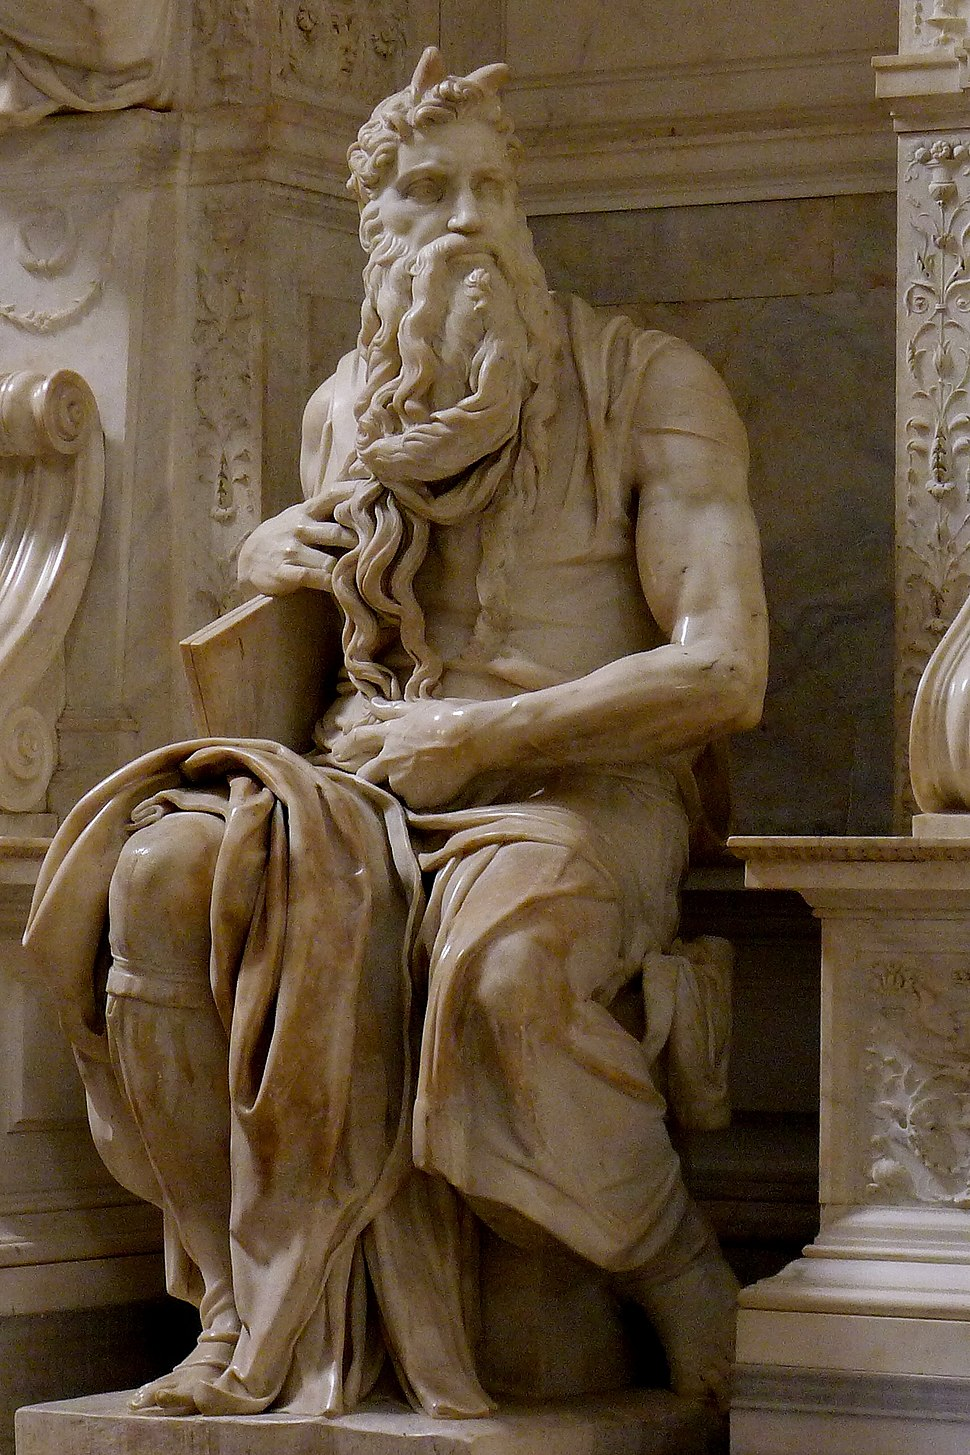 'Moses' by Michelangelo JBU140